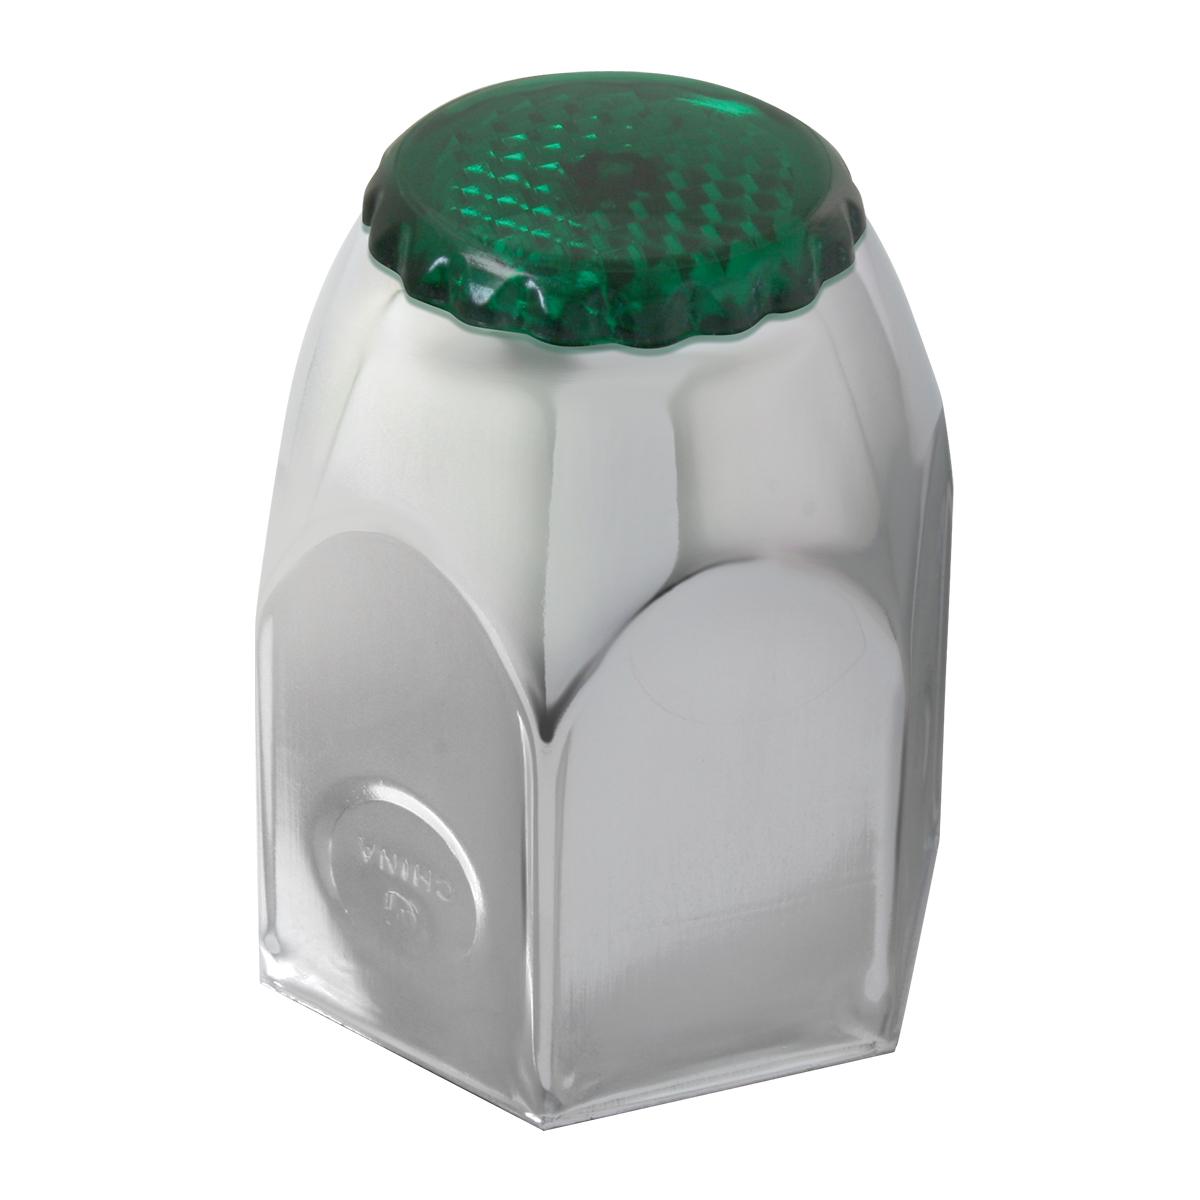 10420 Chrome Steel Green Reflector Push-On Lug Nut Cover w/o Flange